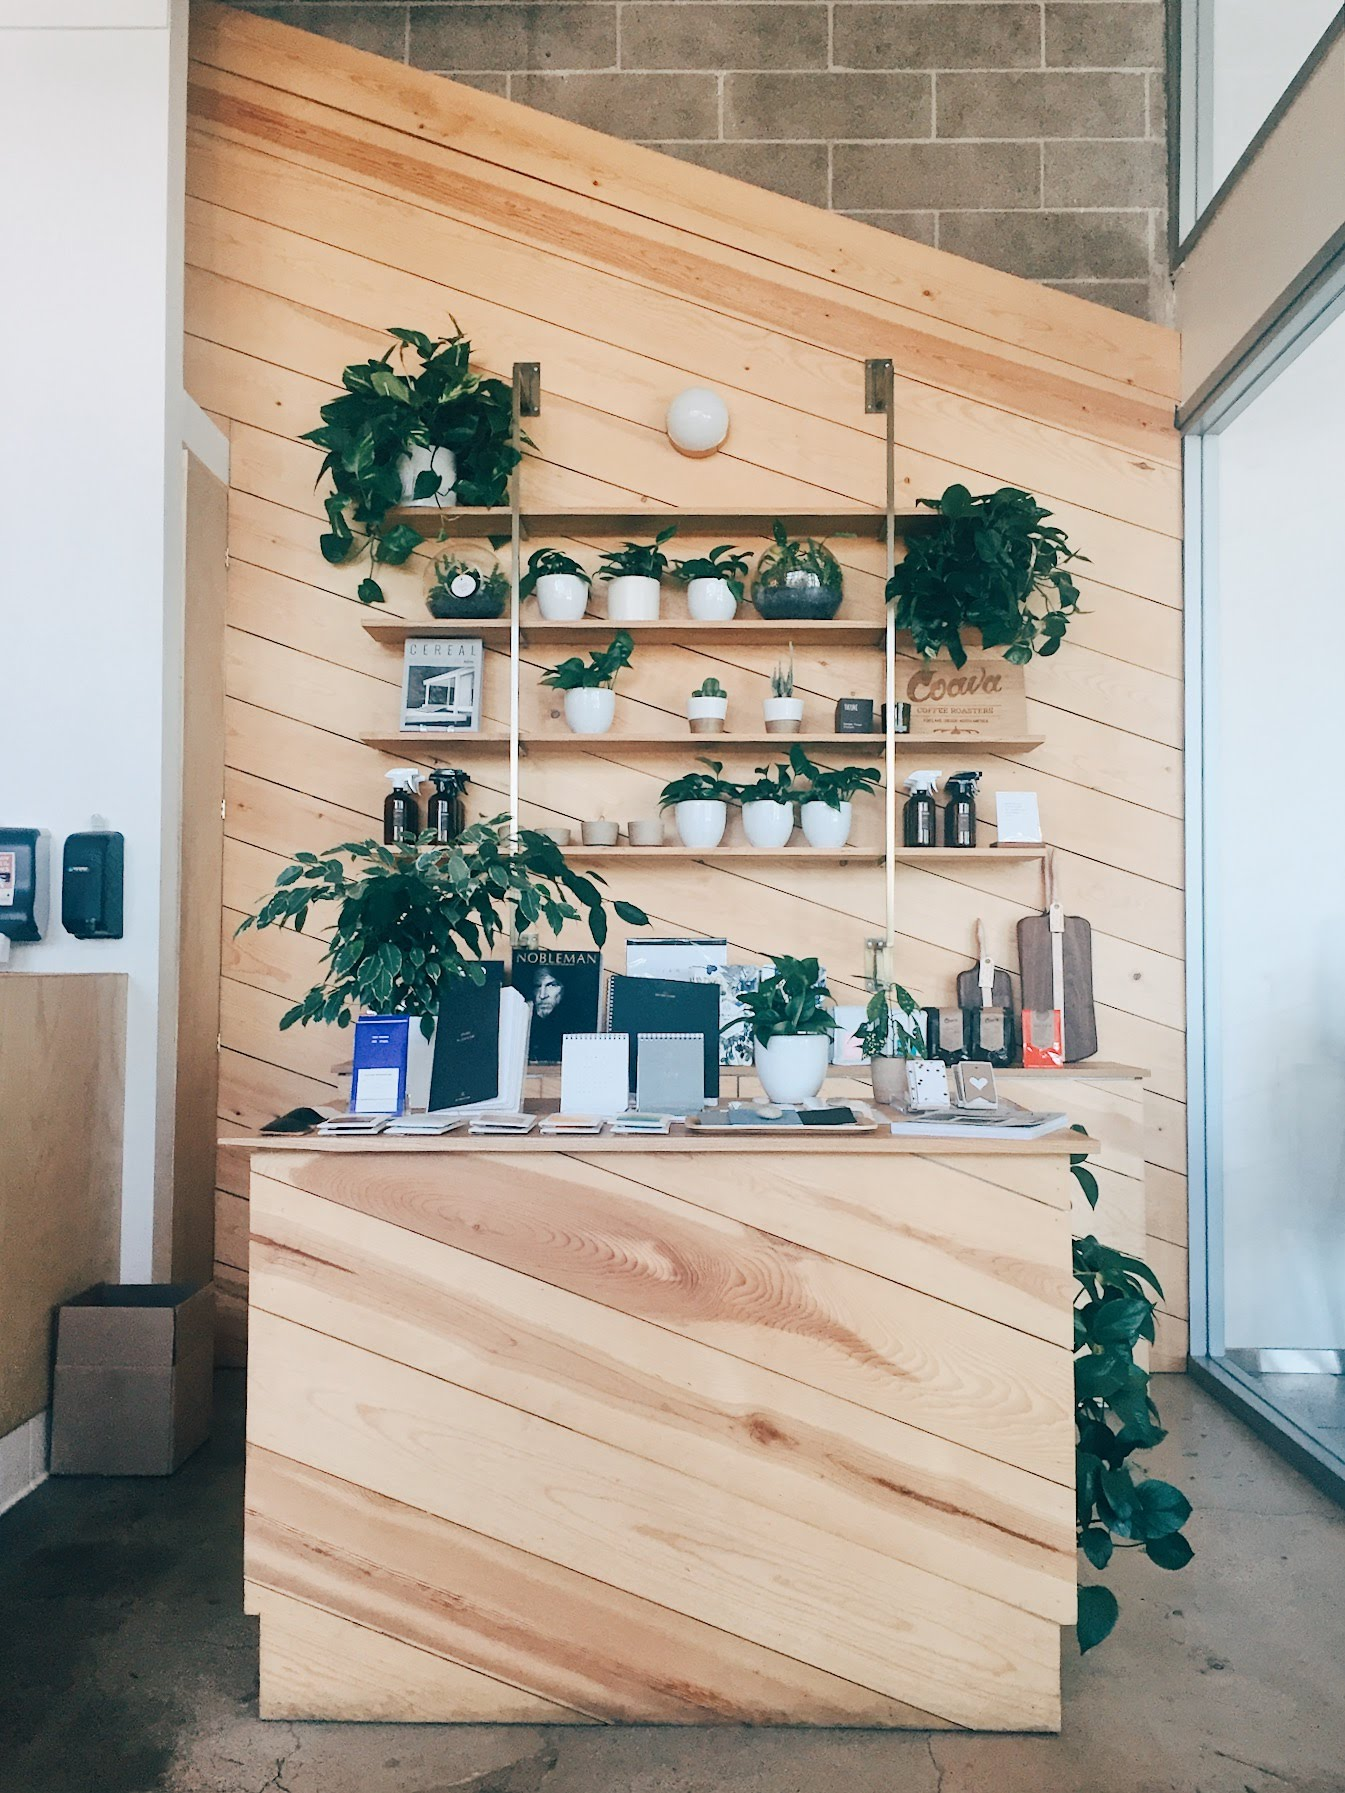 kit coffee shop interior in newport beach, ca